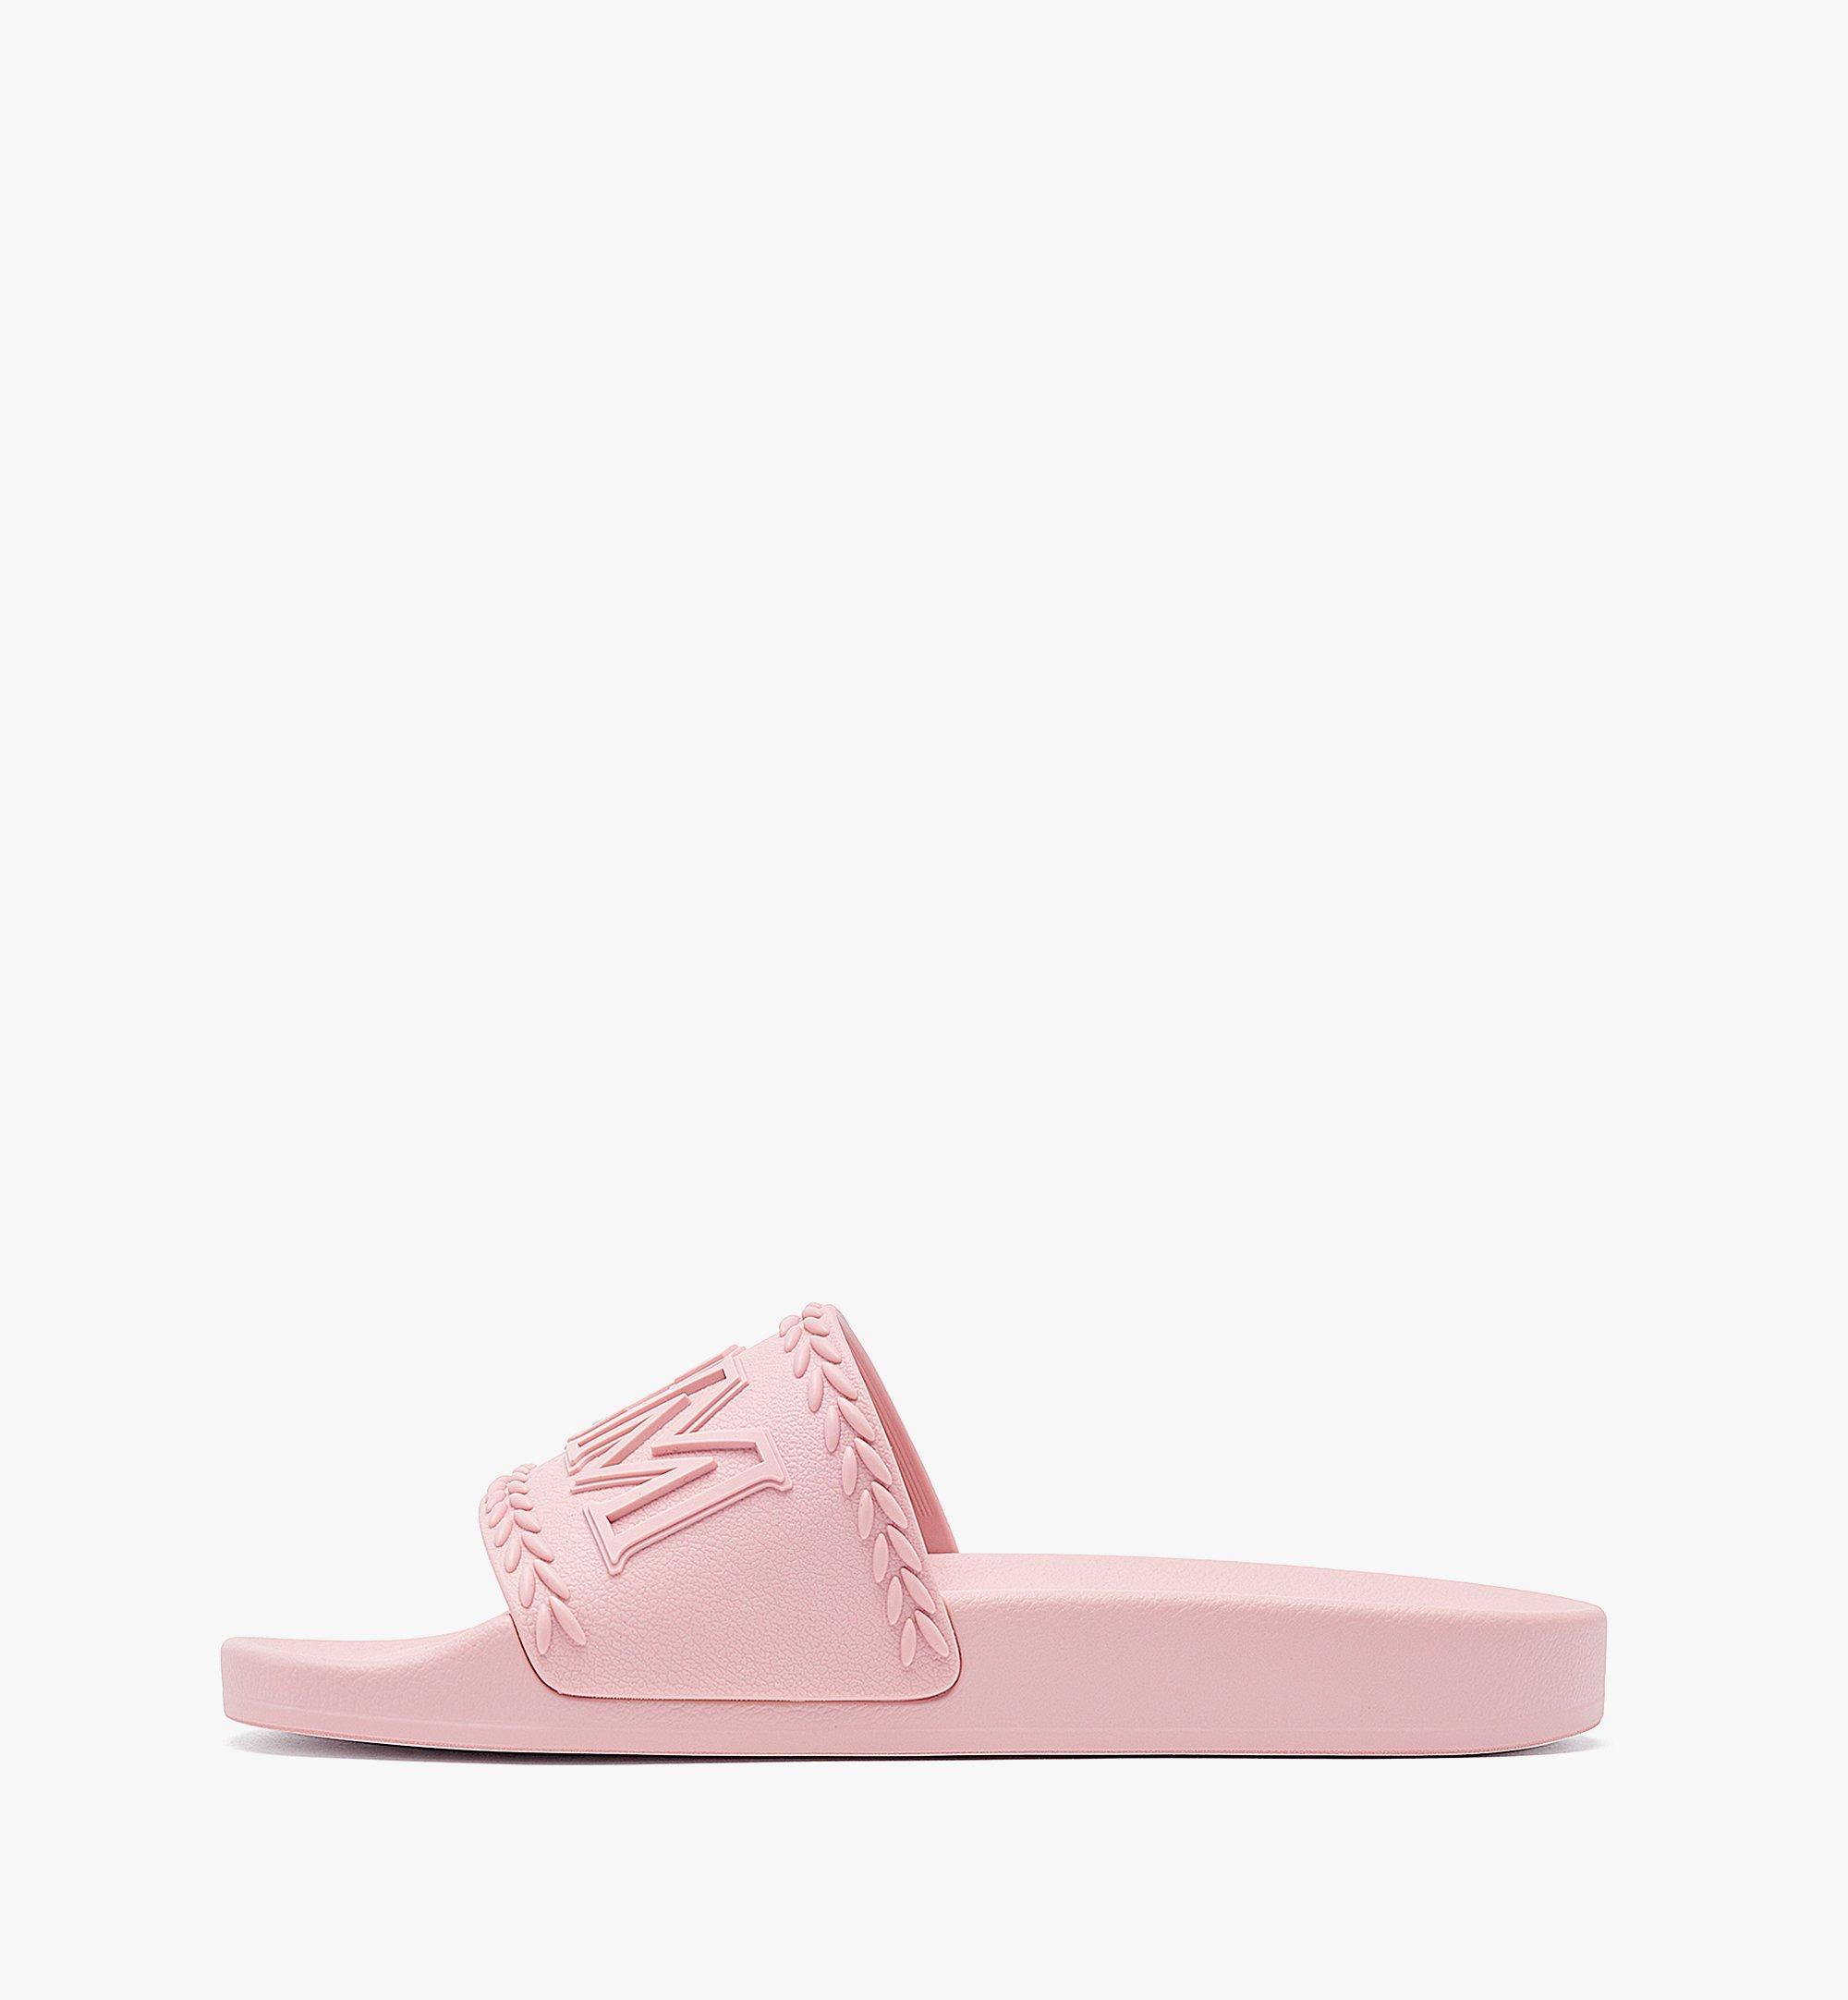 MCM 女士Big Logo橡胶拖鞋 Pink MESBSMM15QH035 更多视角 1